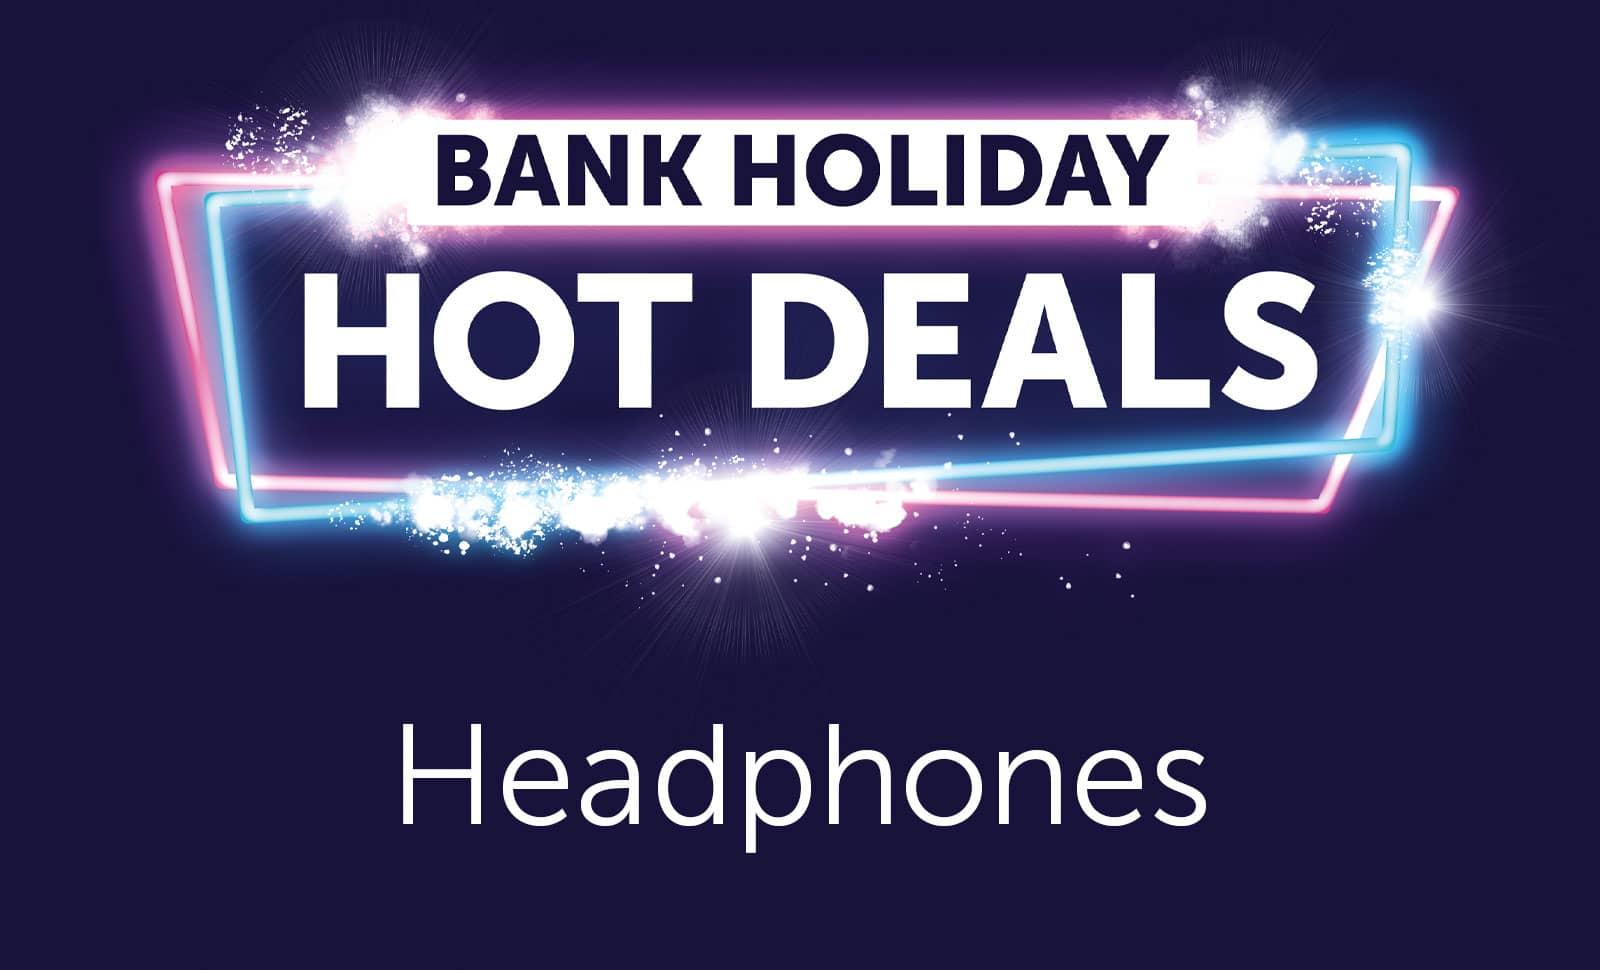 Bank Holiday - Headphones